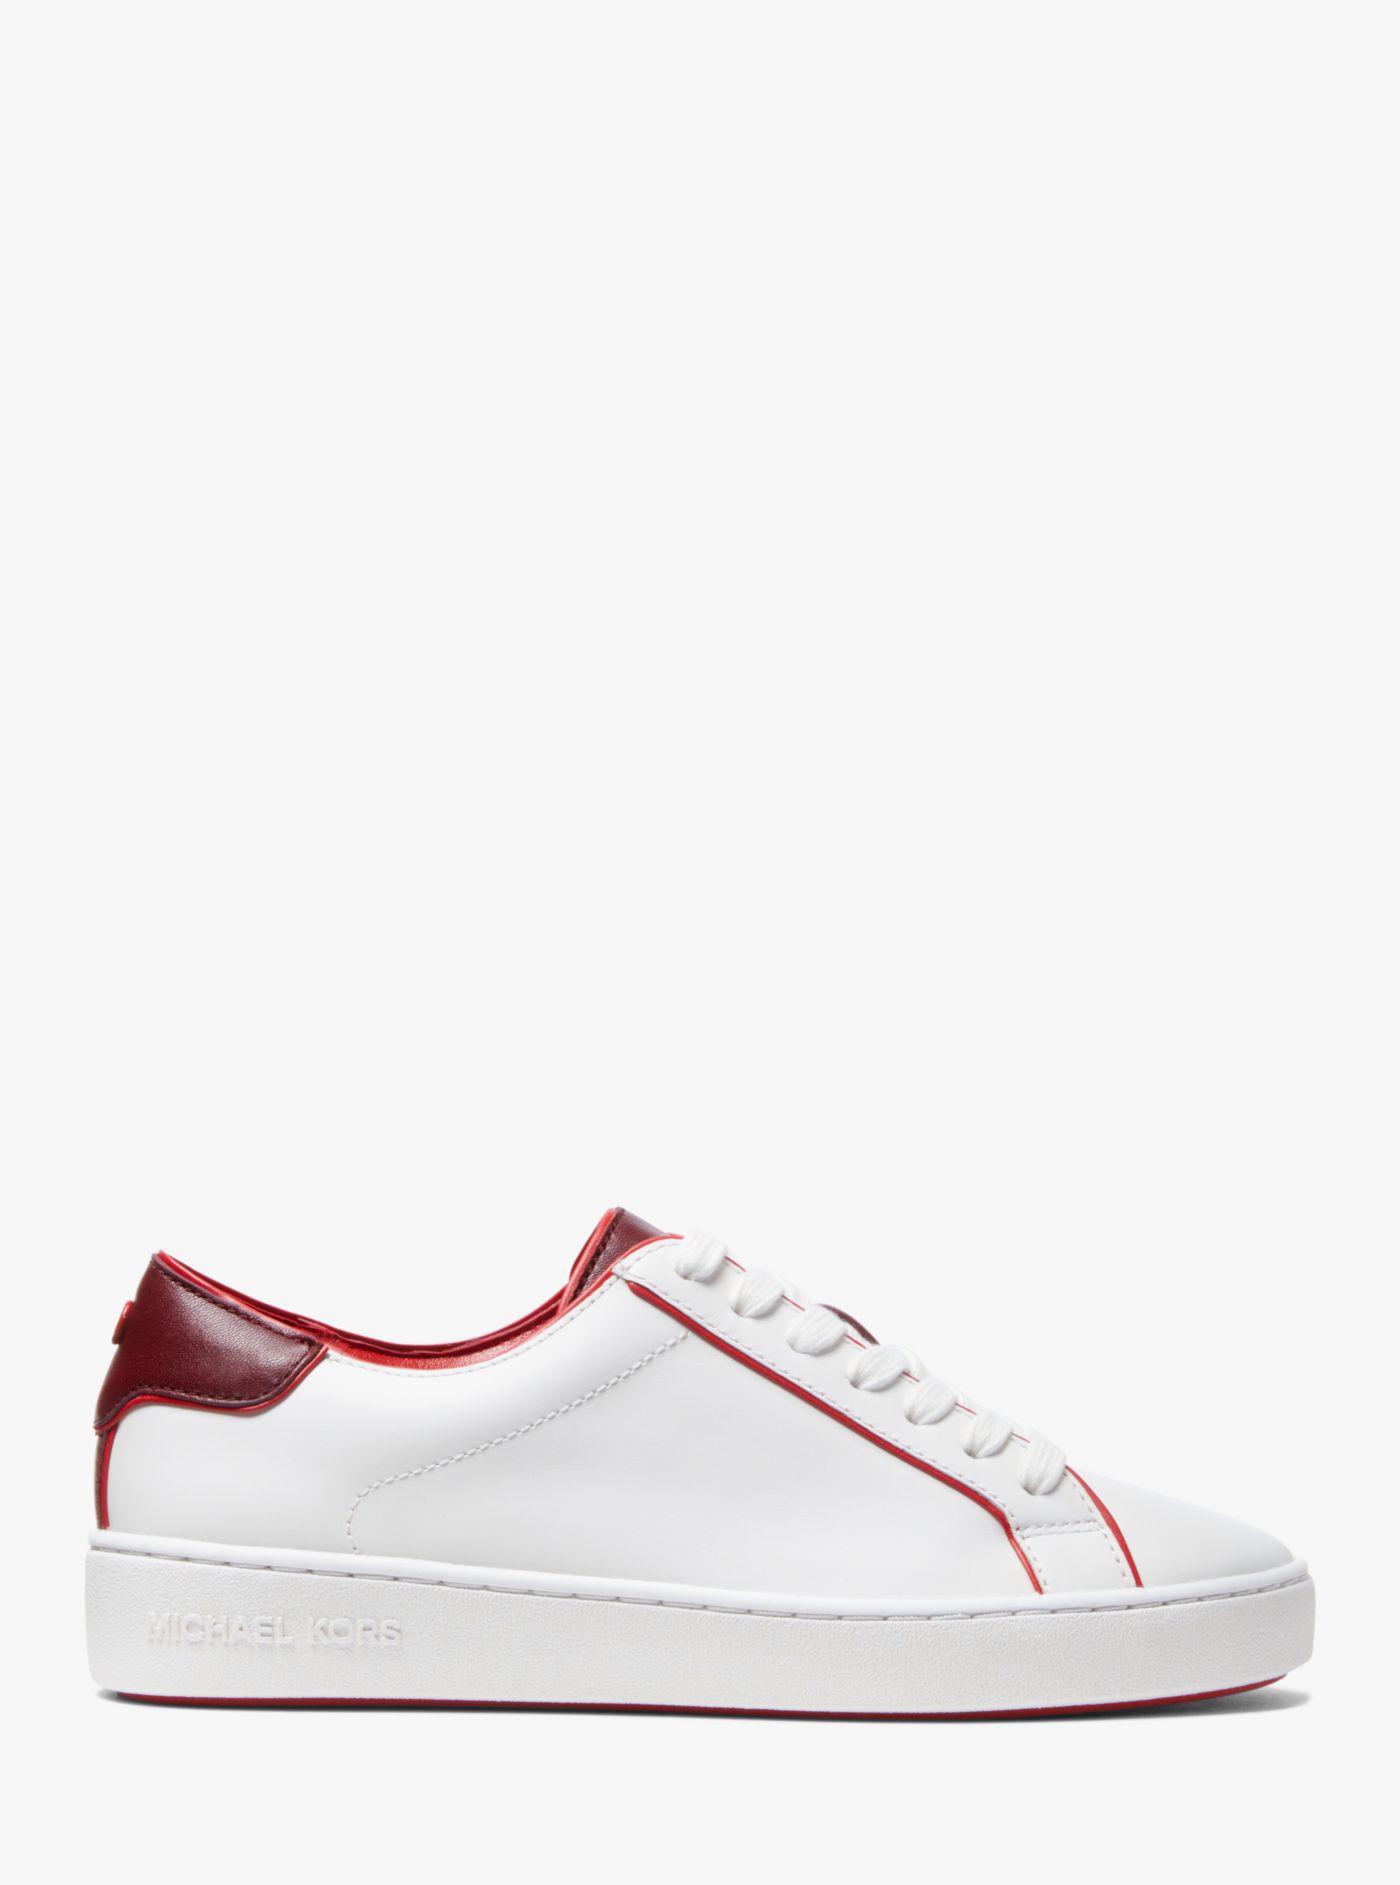 Michael Kors Harper Leather Sneaker - Lyst